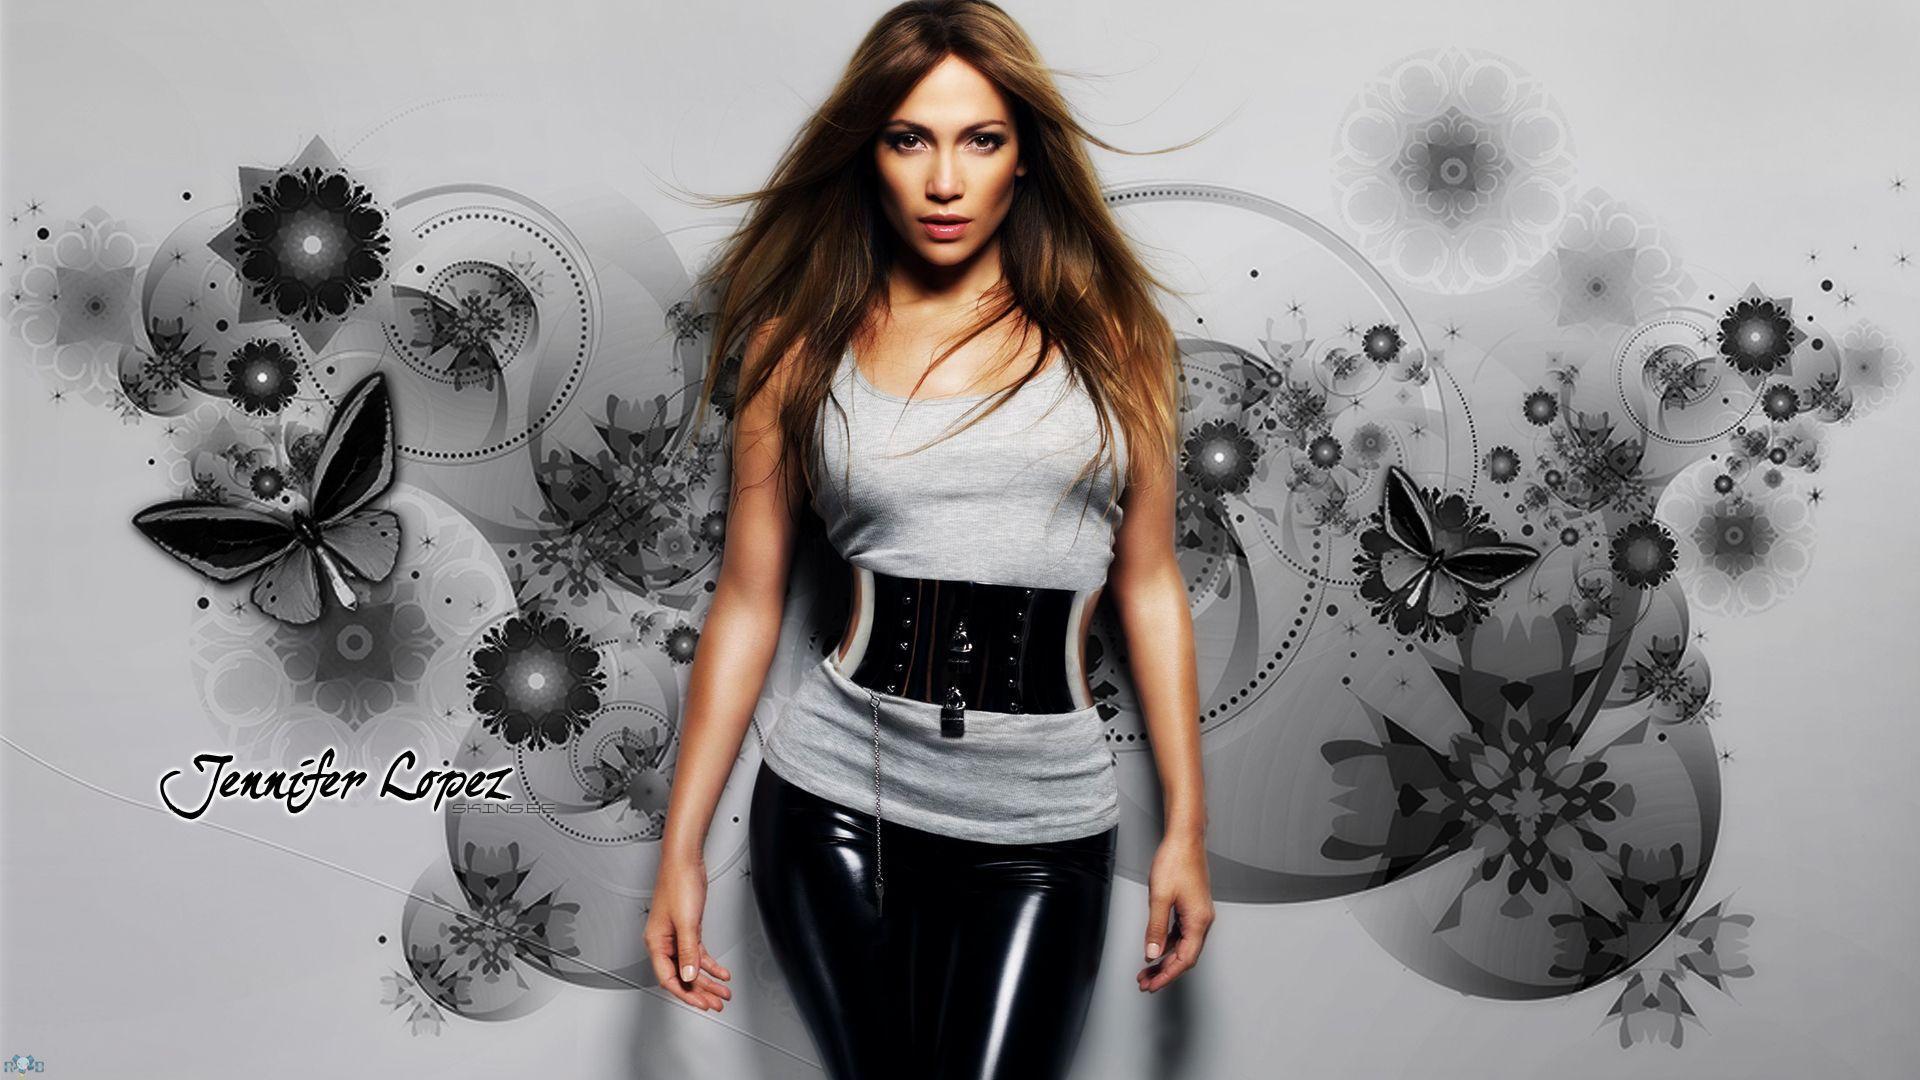 Jennifer Lopez Wallpapers 2015